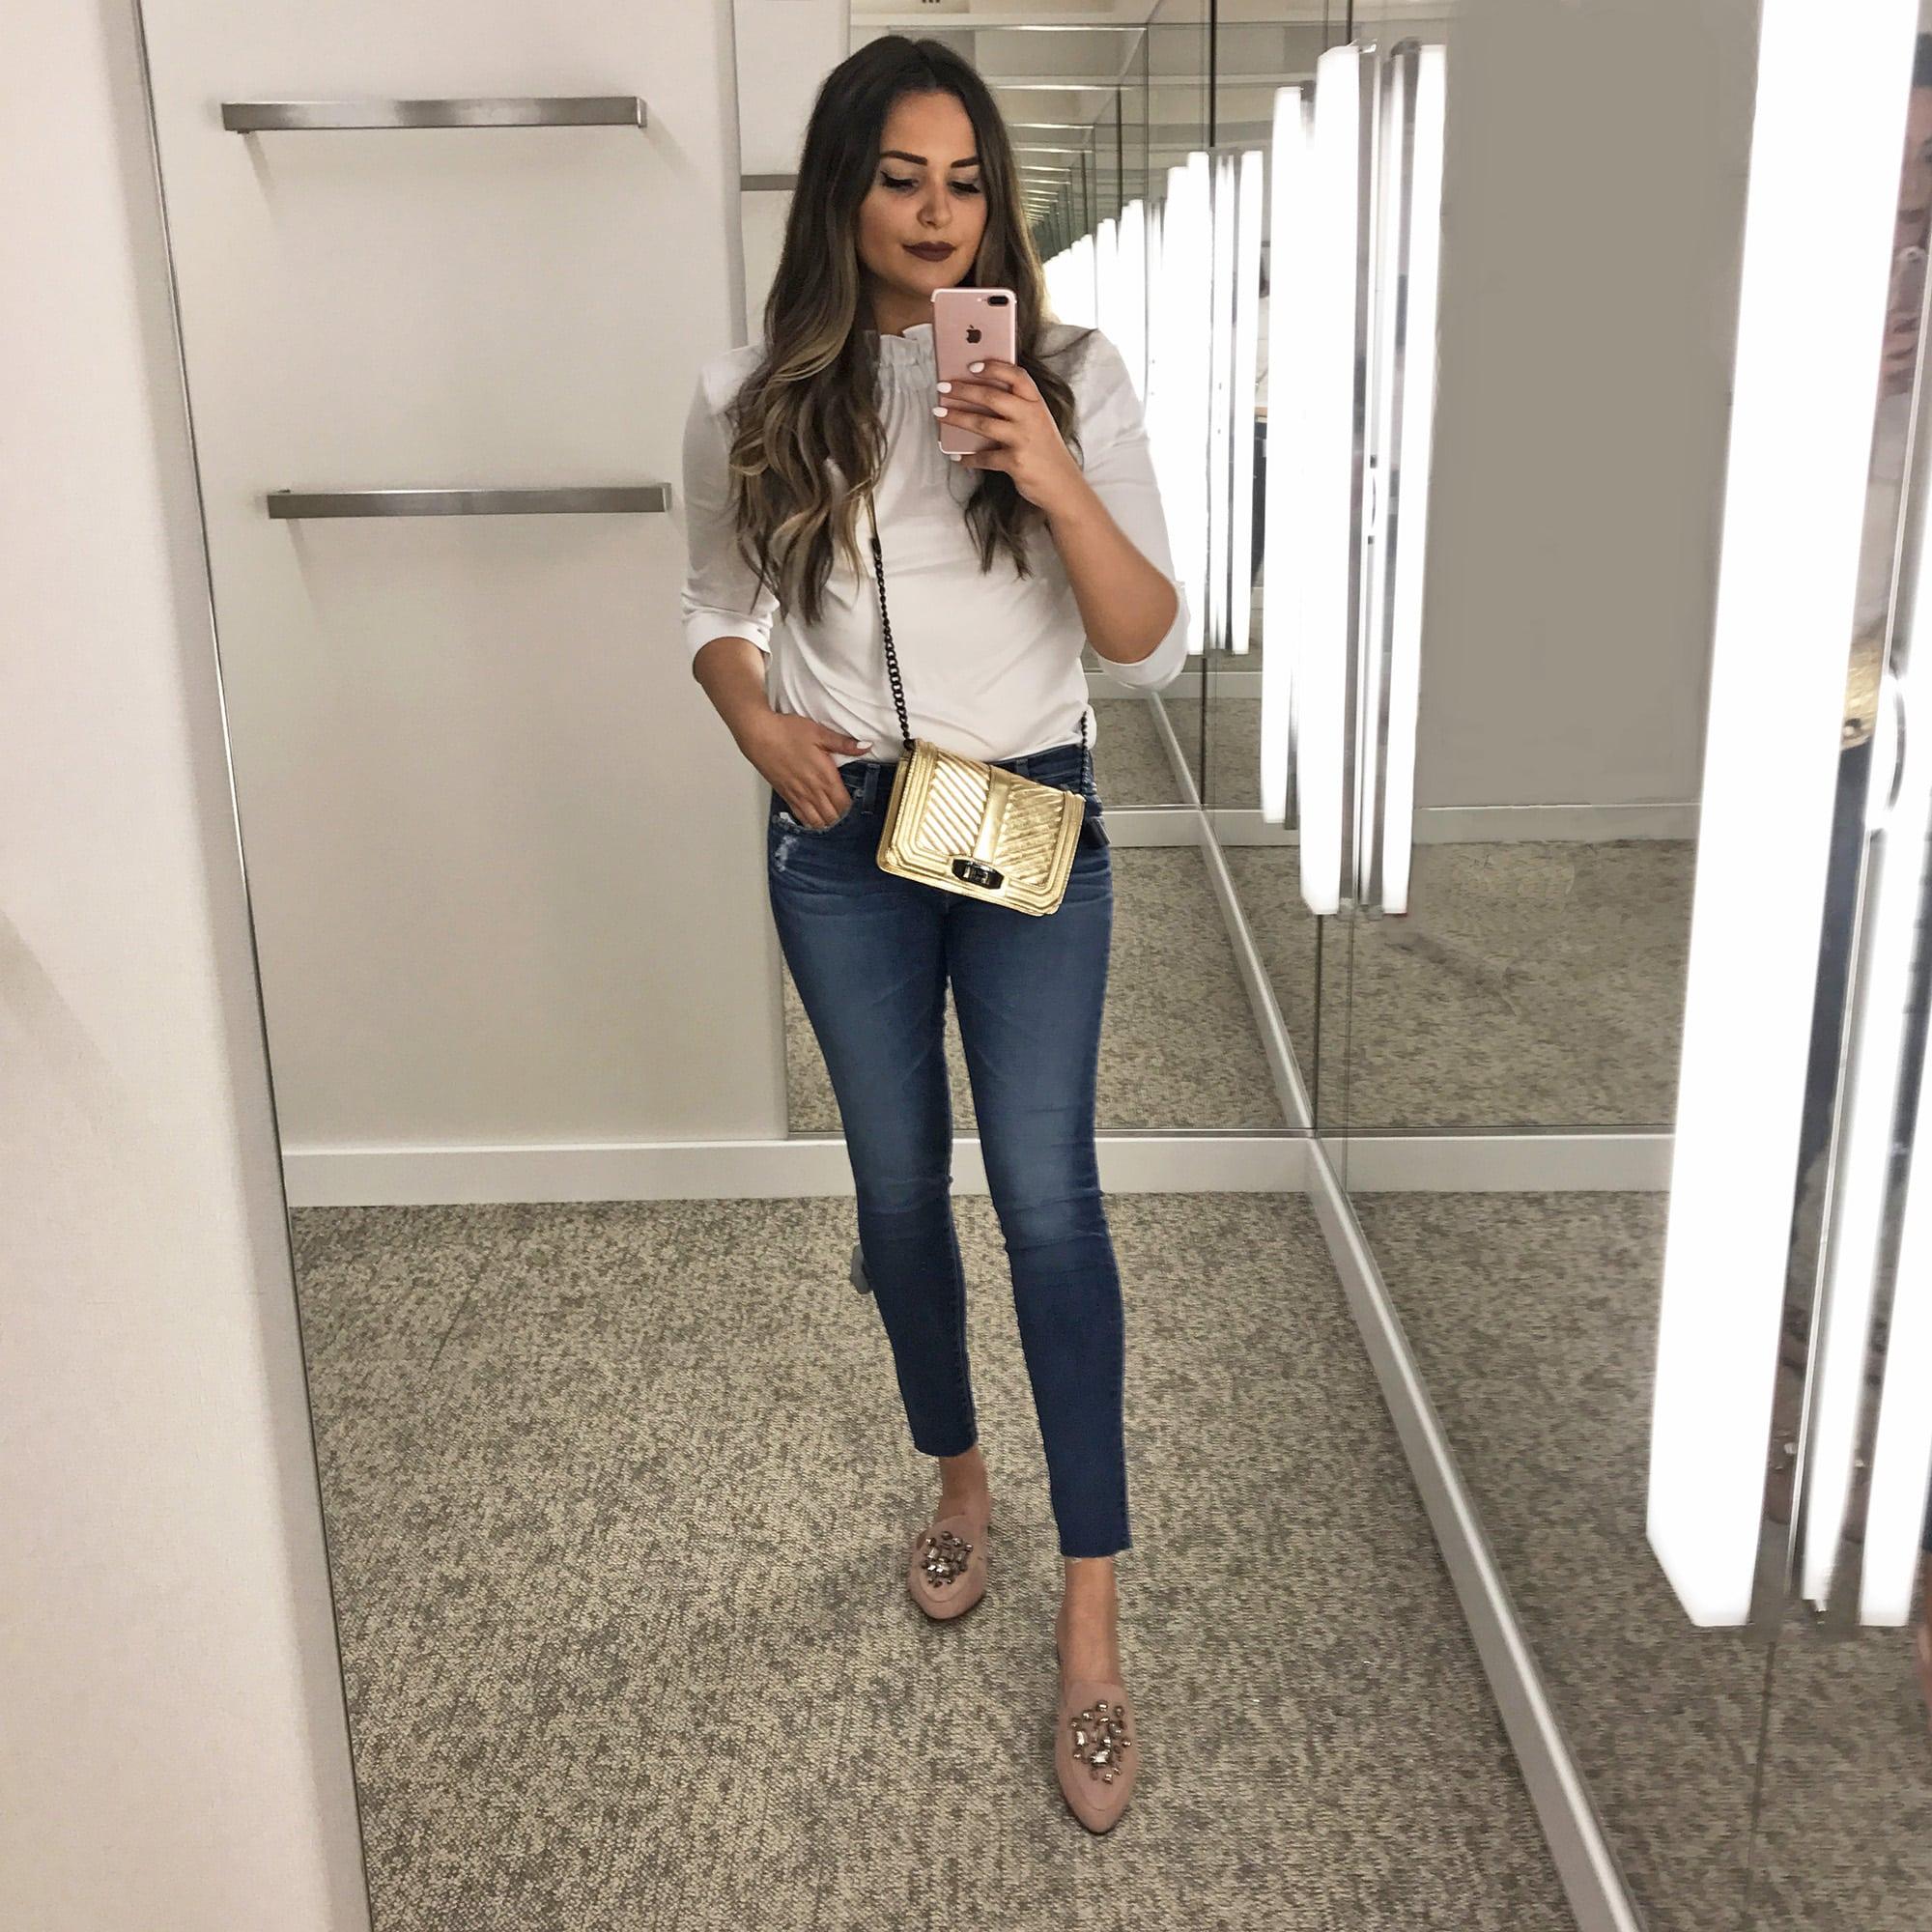 Nordstrom try on haul | beauty style blogger Mash Elle |  Nordstrom Anniversary Sale | crossbody